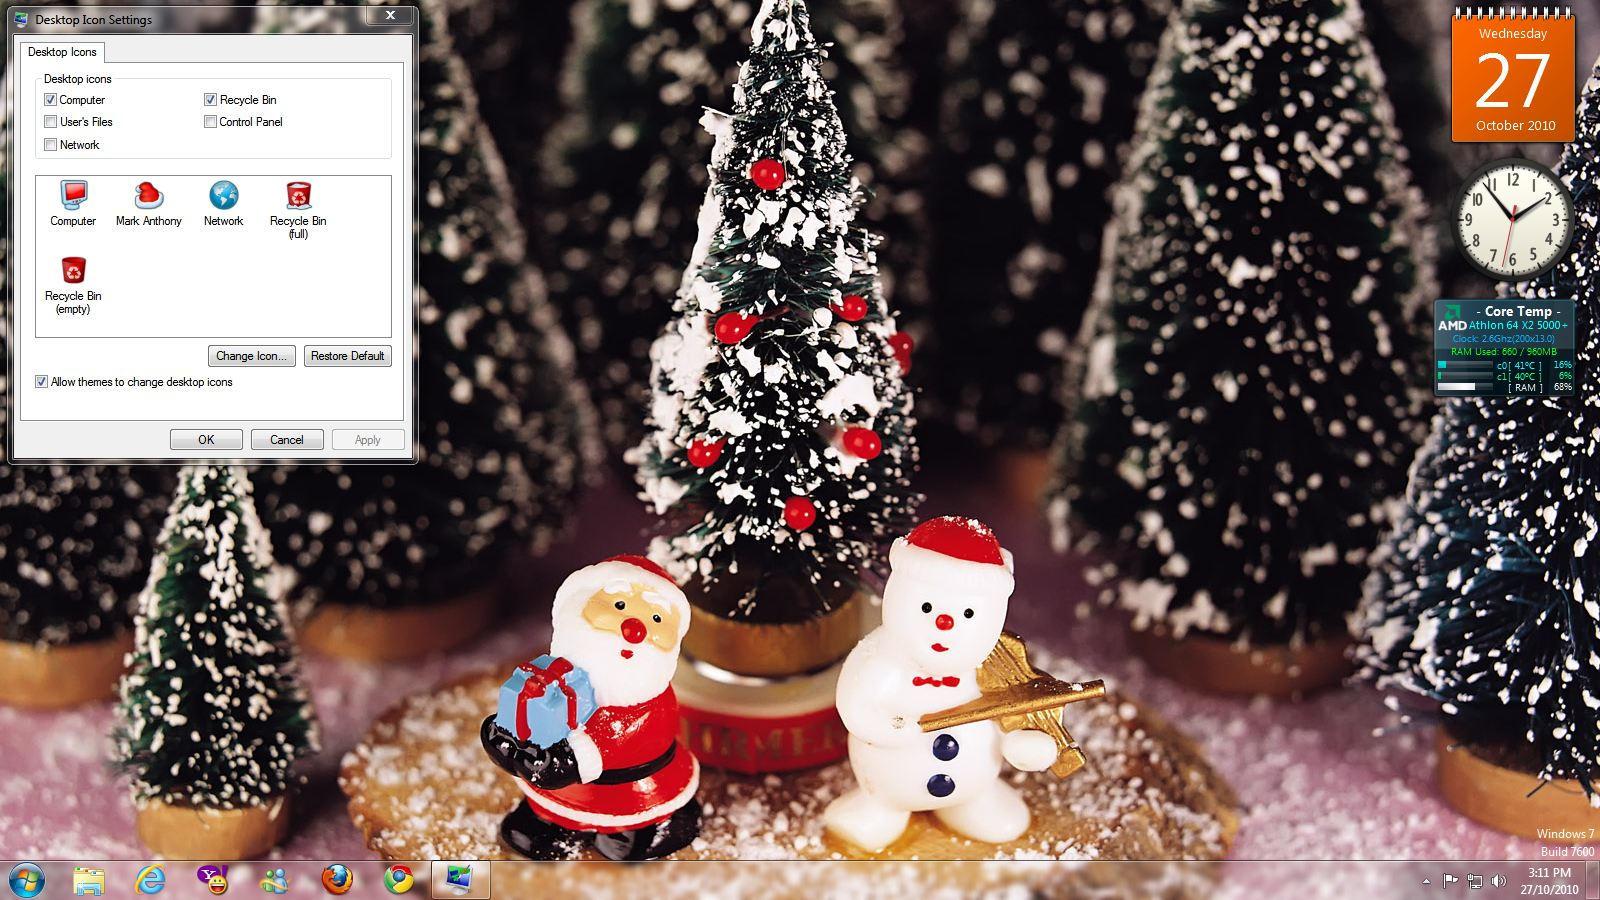 Windows 7 Christmas Theme by blackboy993